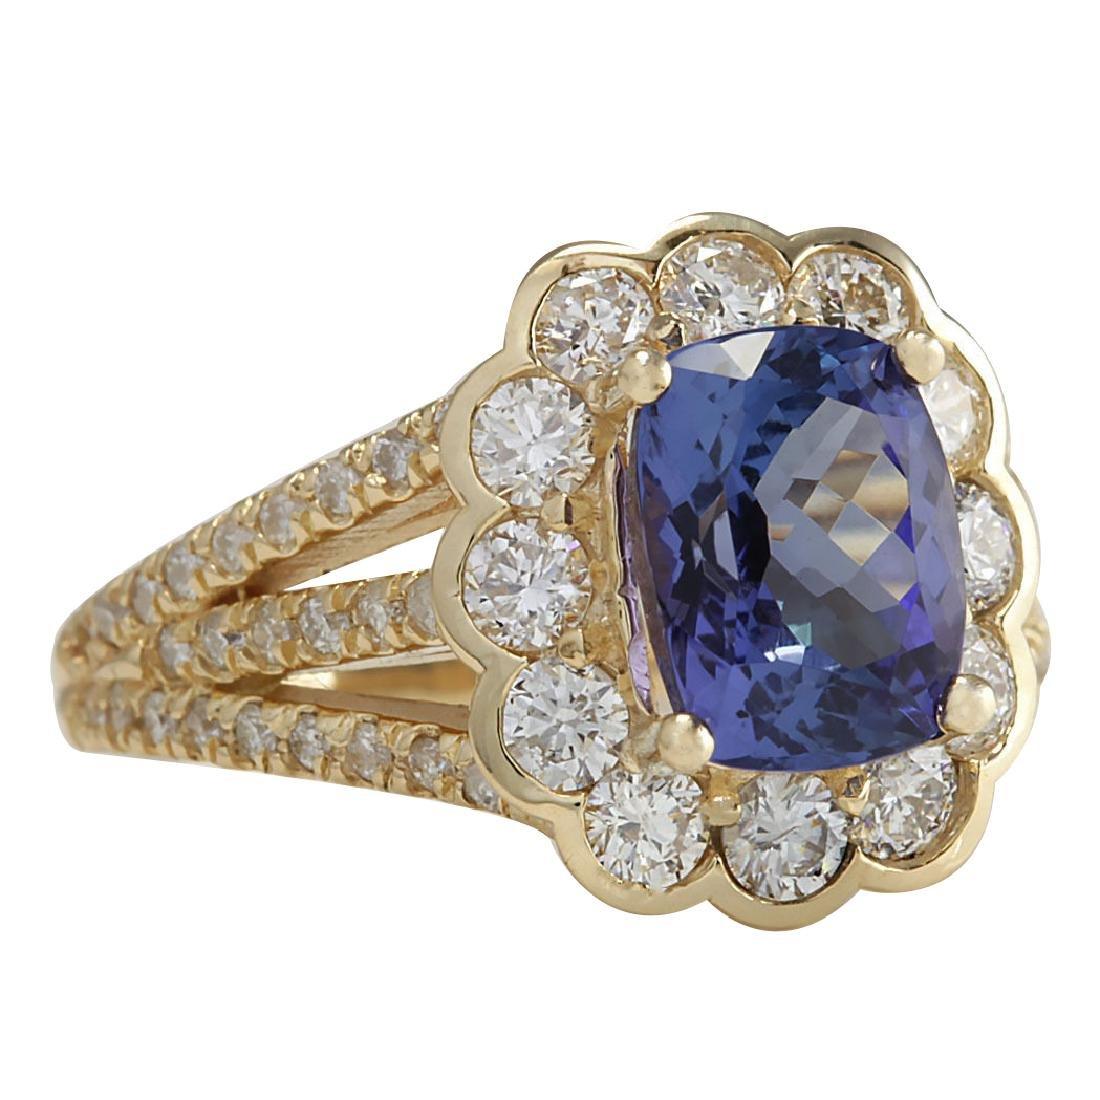 3.65CTW Natural Tanzanite And Diamond Ring In 18K - 2